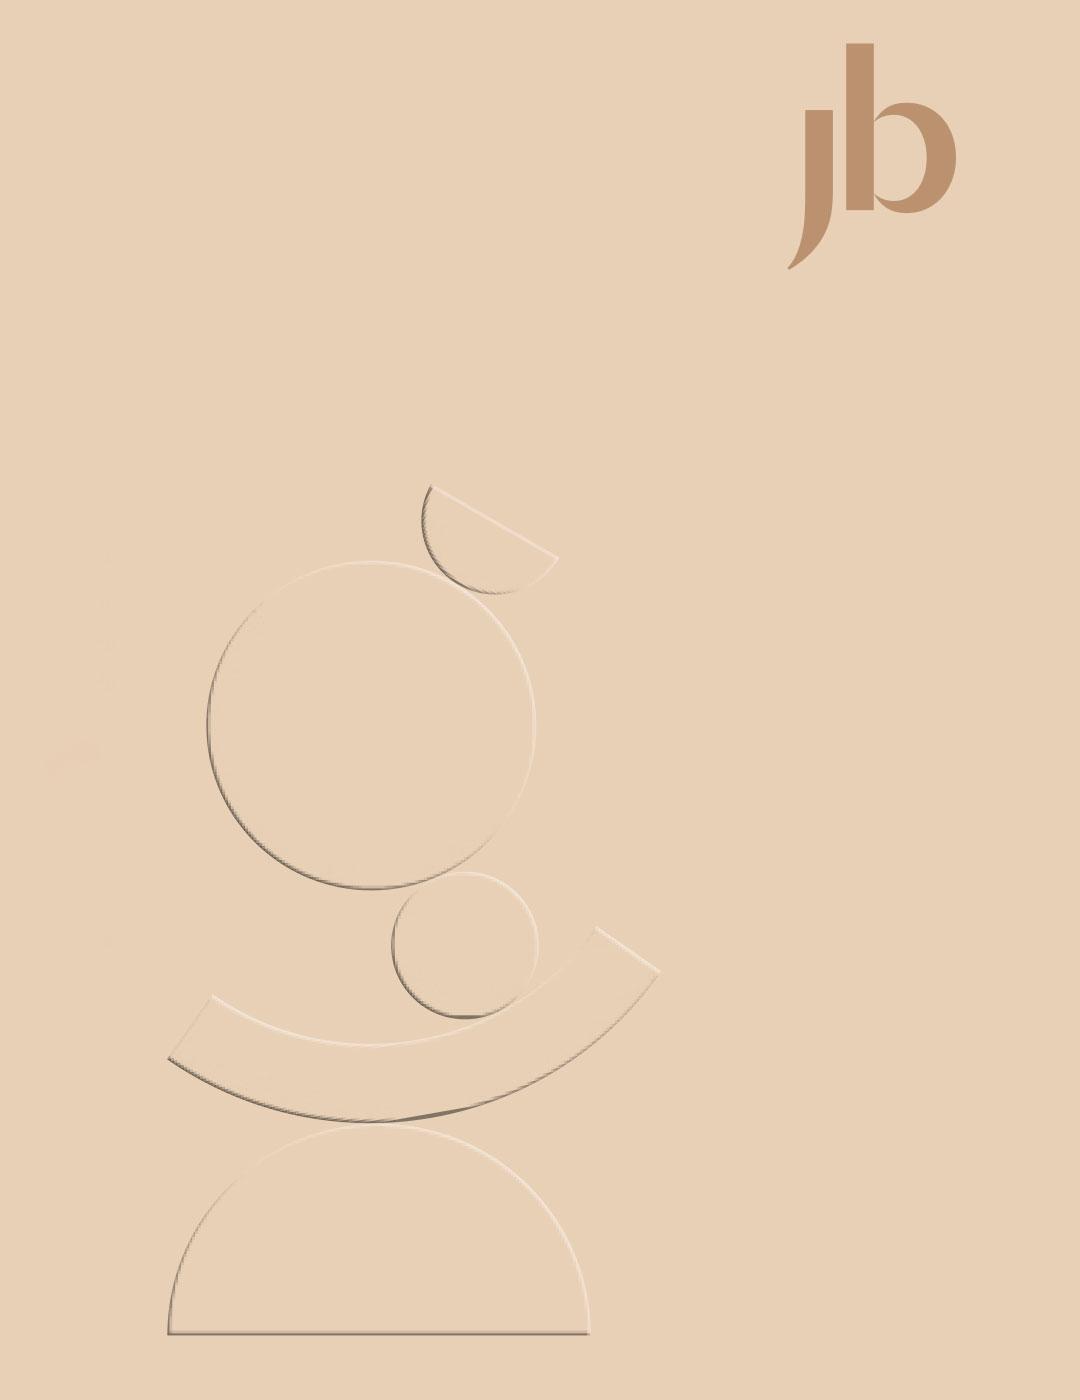 Branding jb Company by toc. designstudio